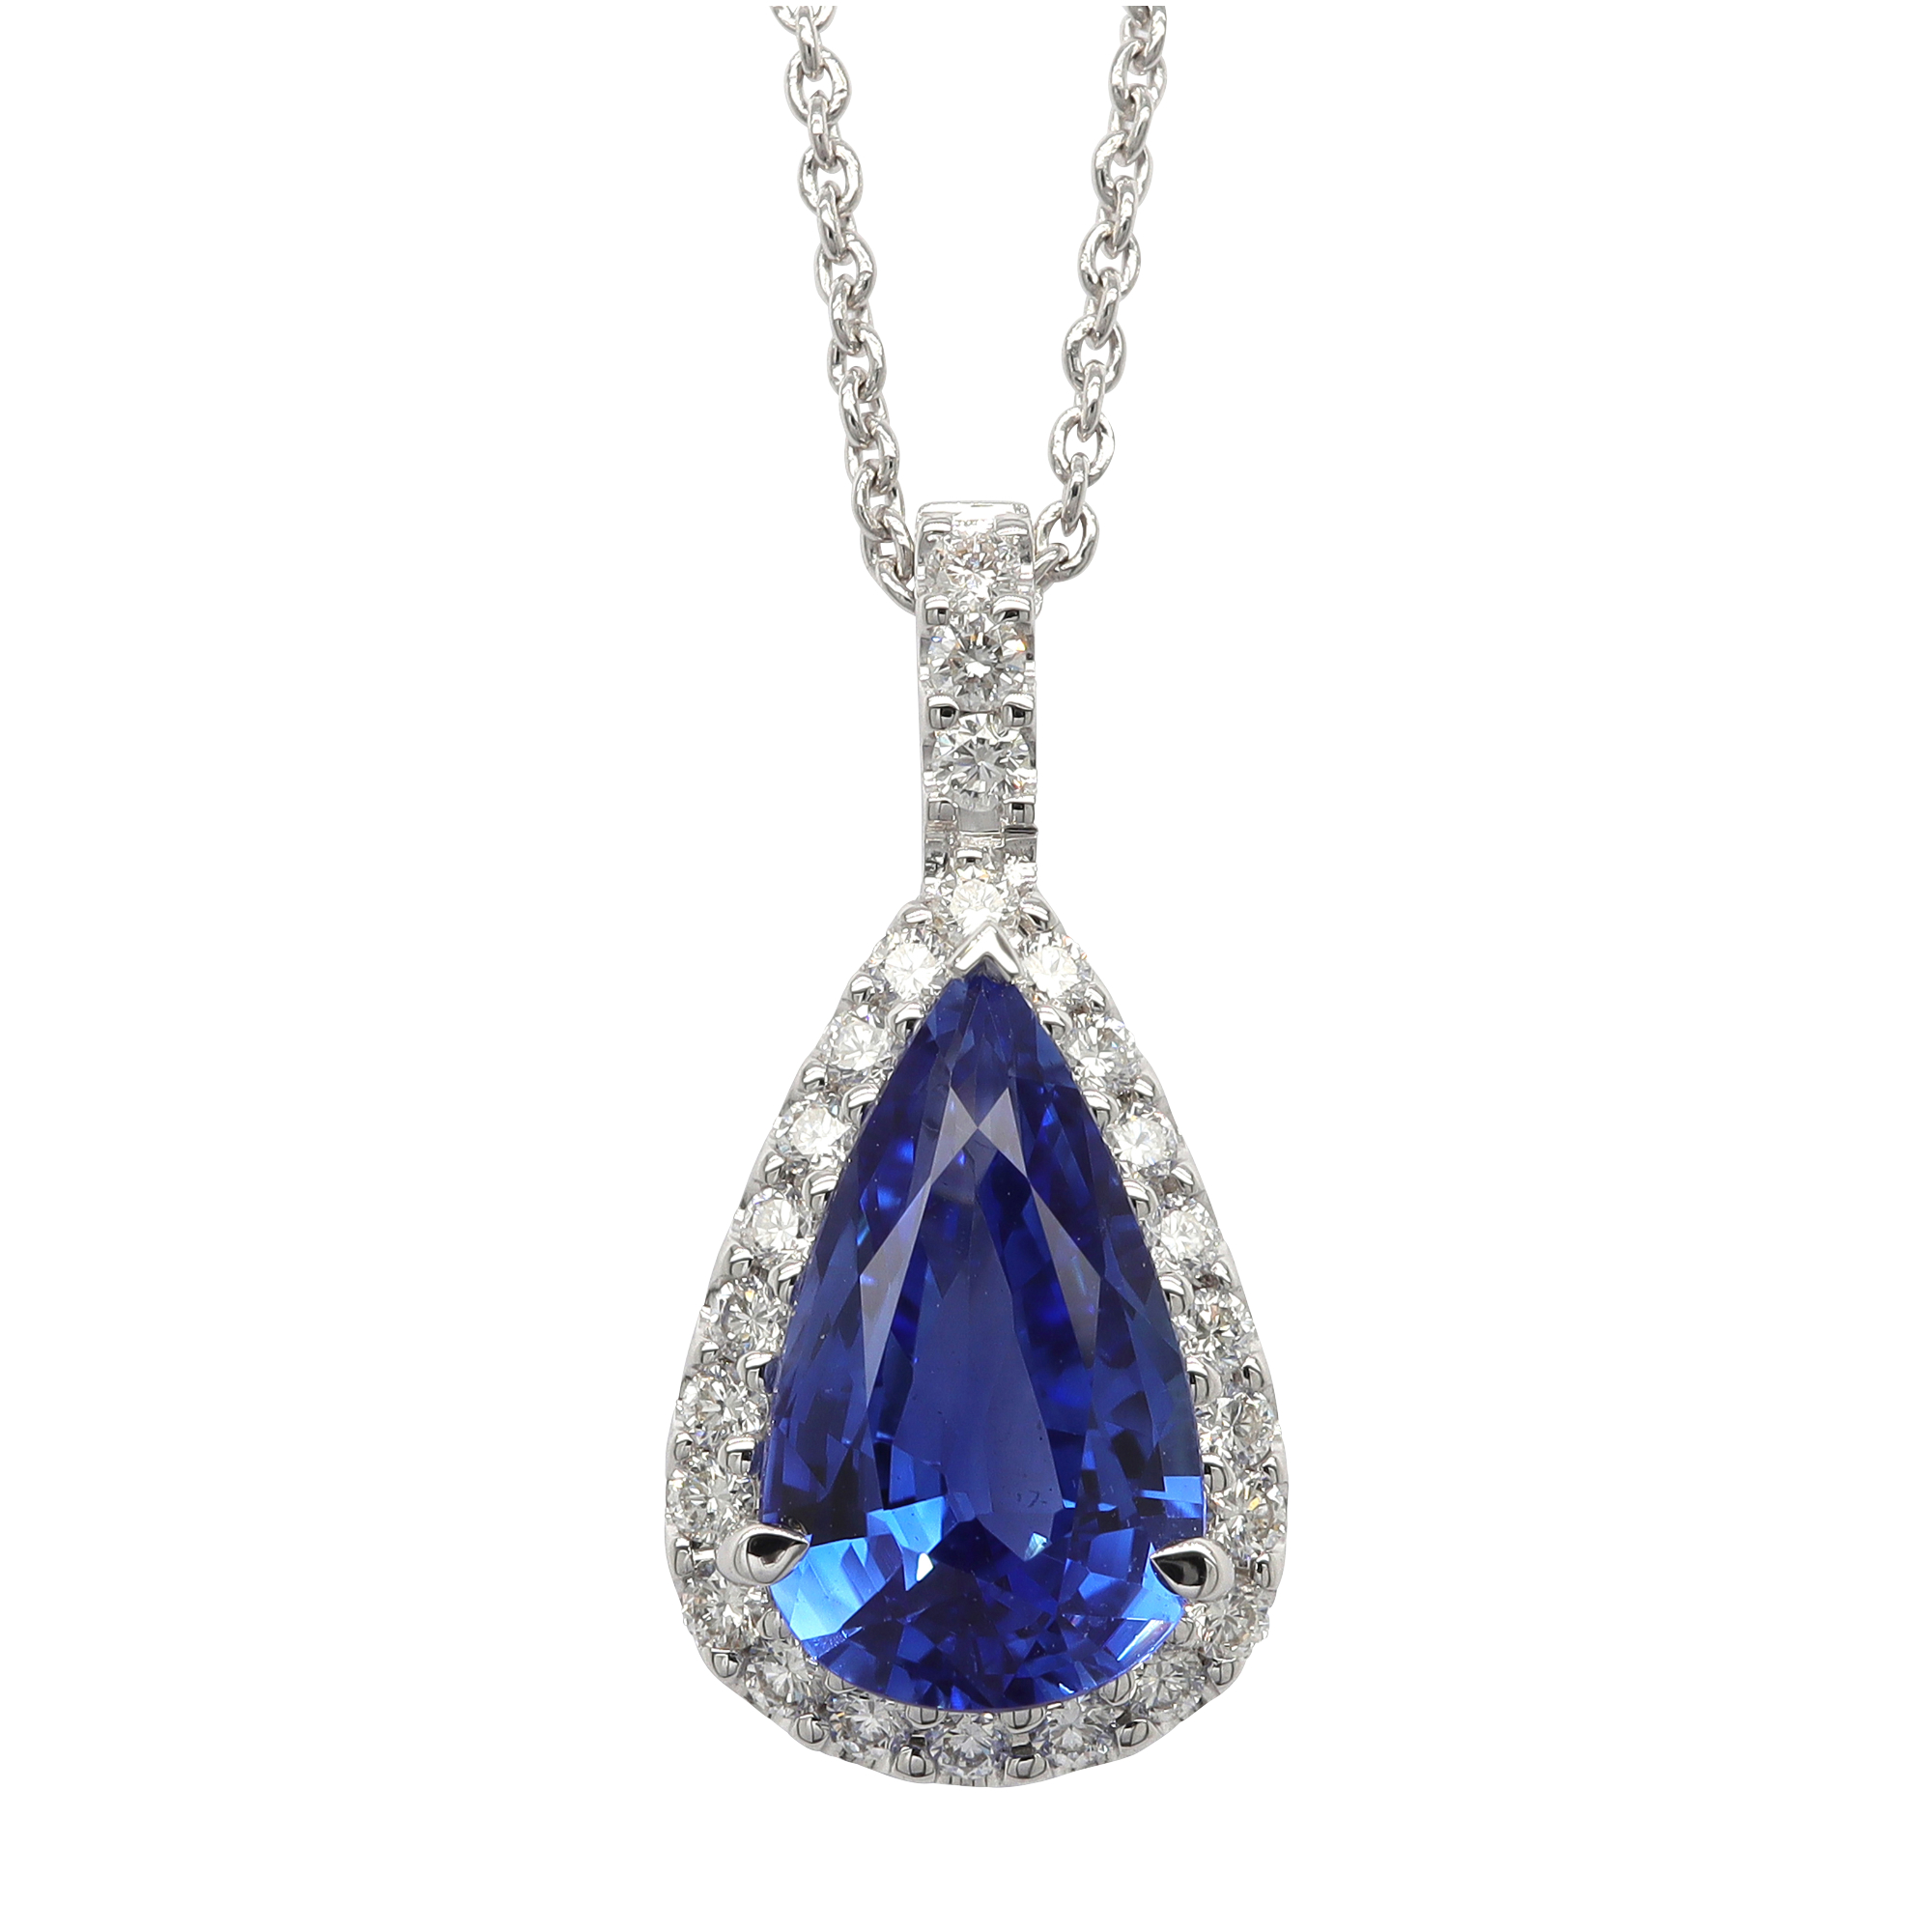 18ct White Gold Diamond & Sapphire Pendant